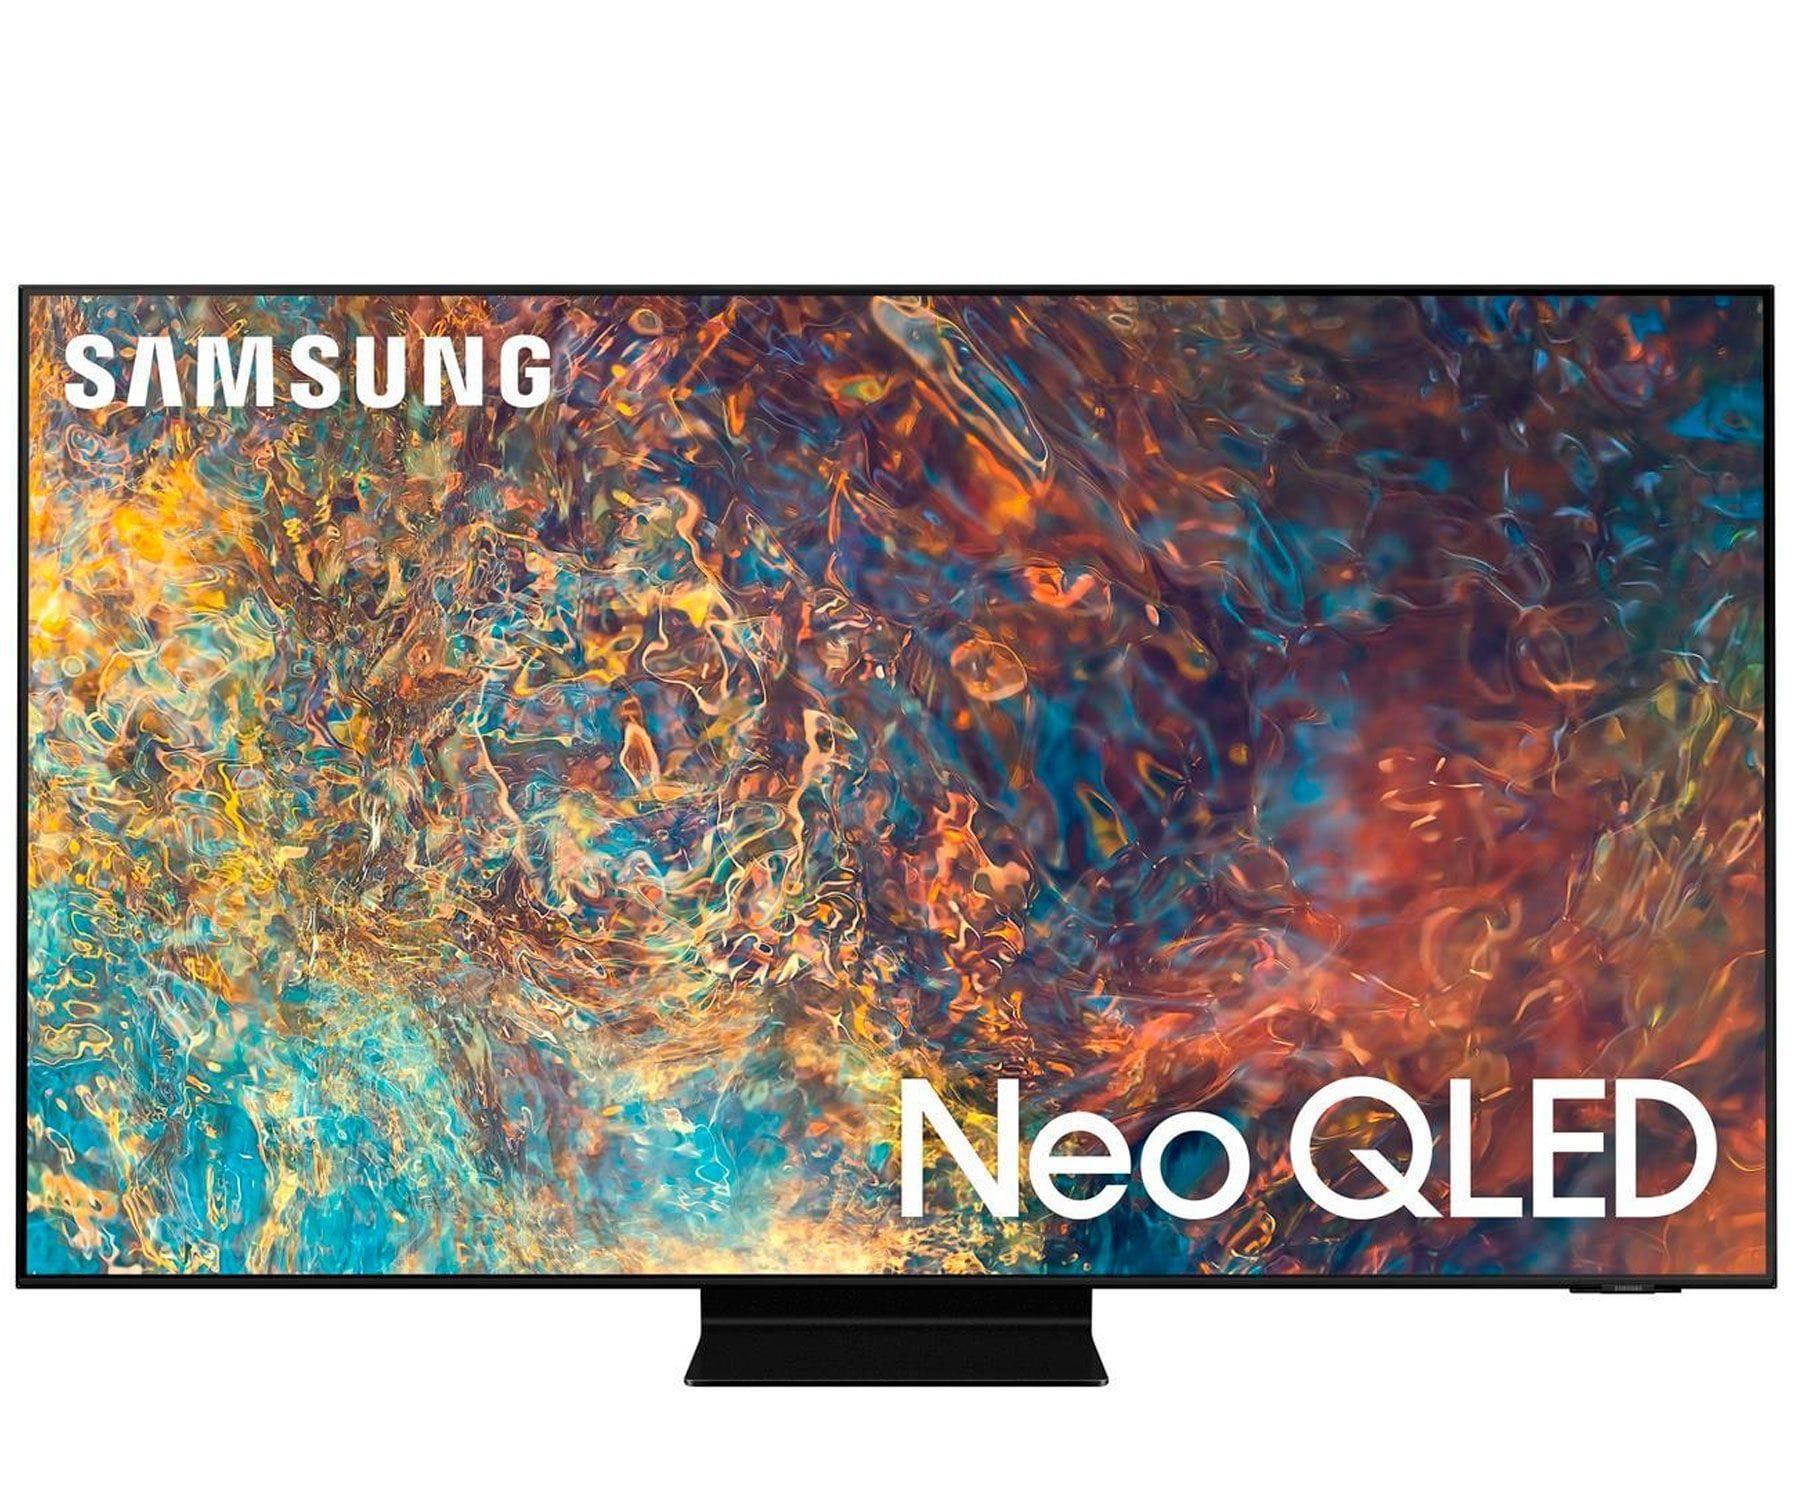 SAMSUNG QE50QN90A TELEVISOR SMART TV 50'' NEO QLED UHD 4K HDR